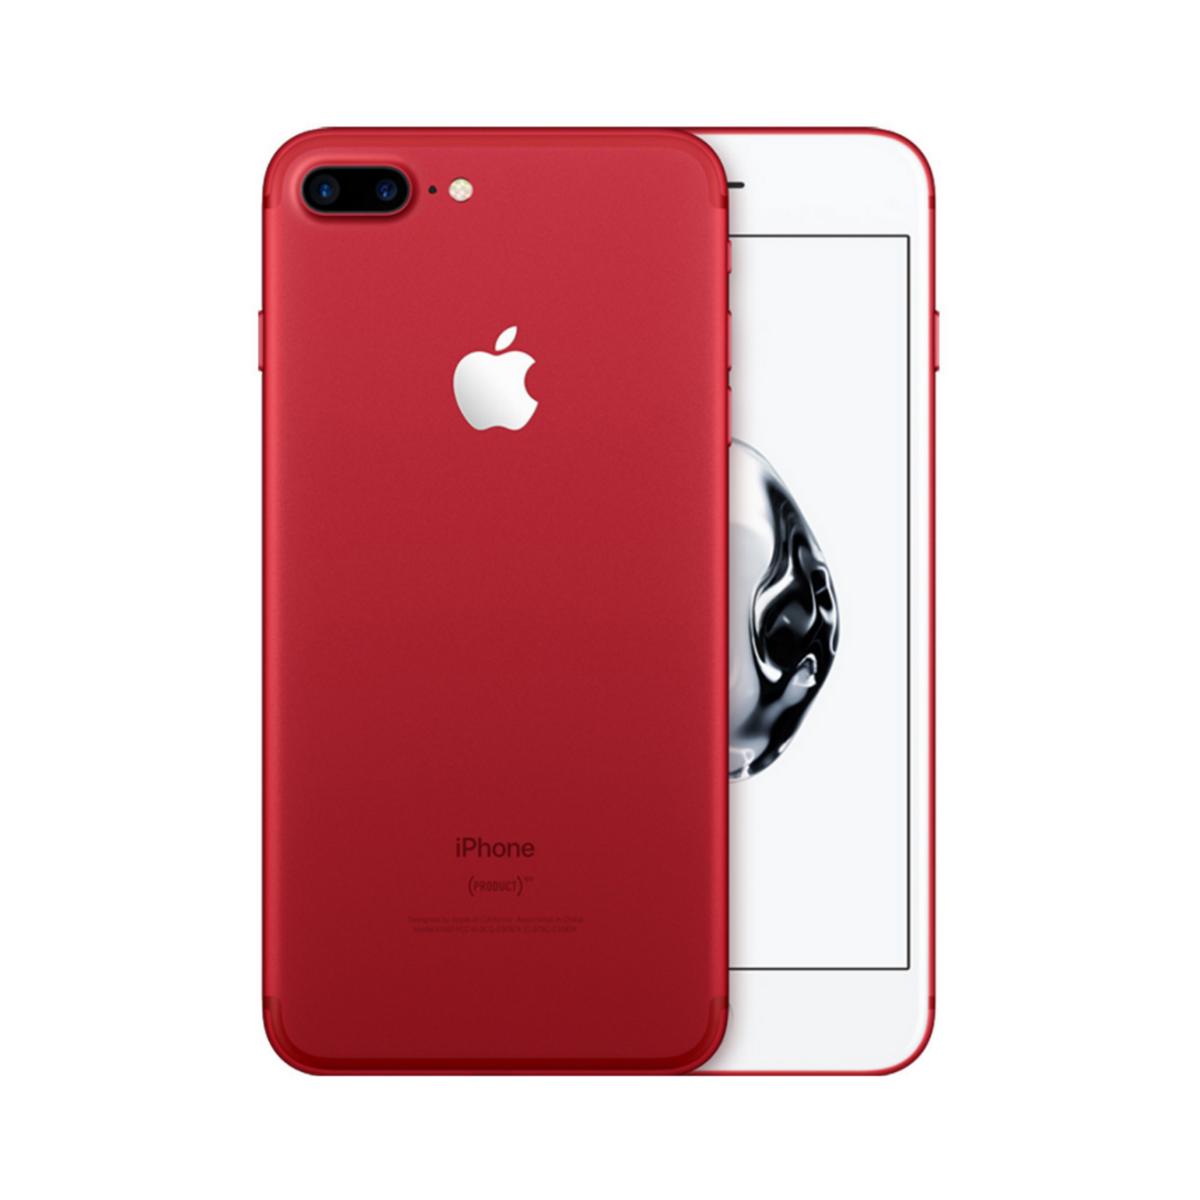 Sim Free Apple iPhone 7 Plus 128GB Unlocked Mobile Phone - (Product) Red